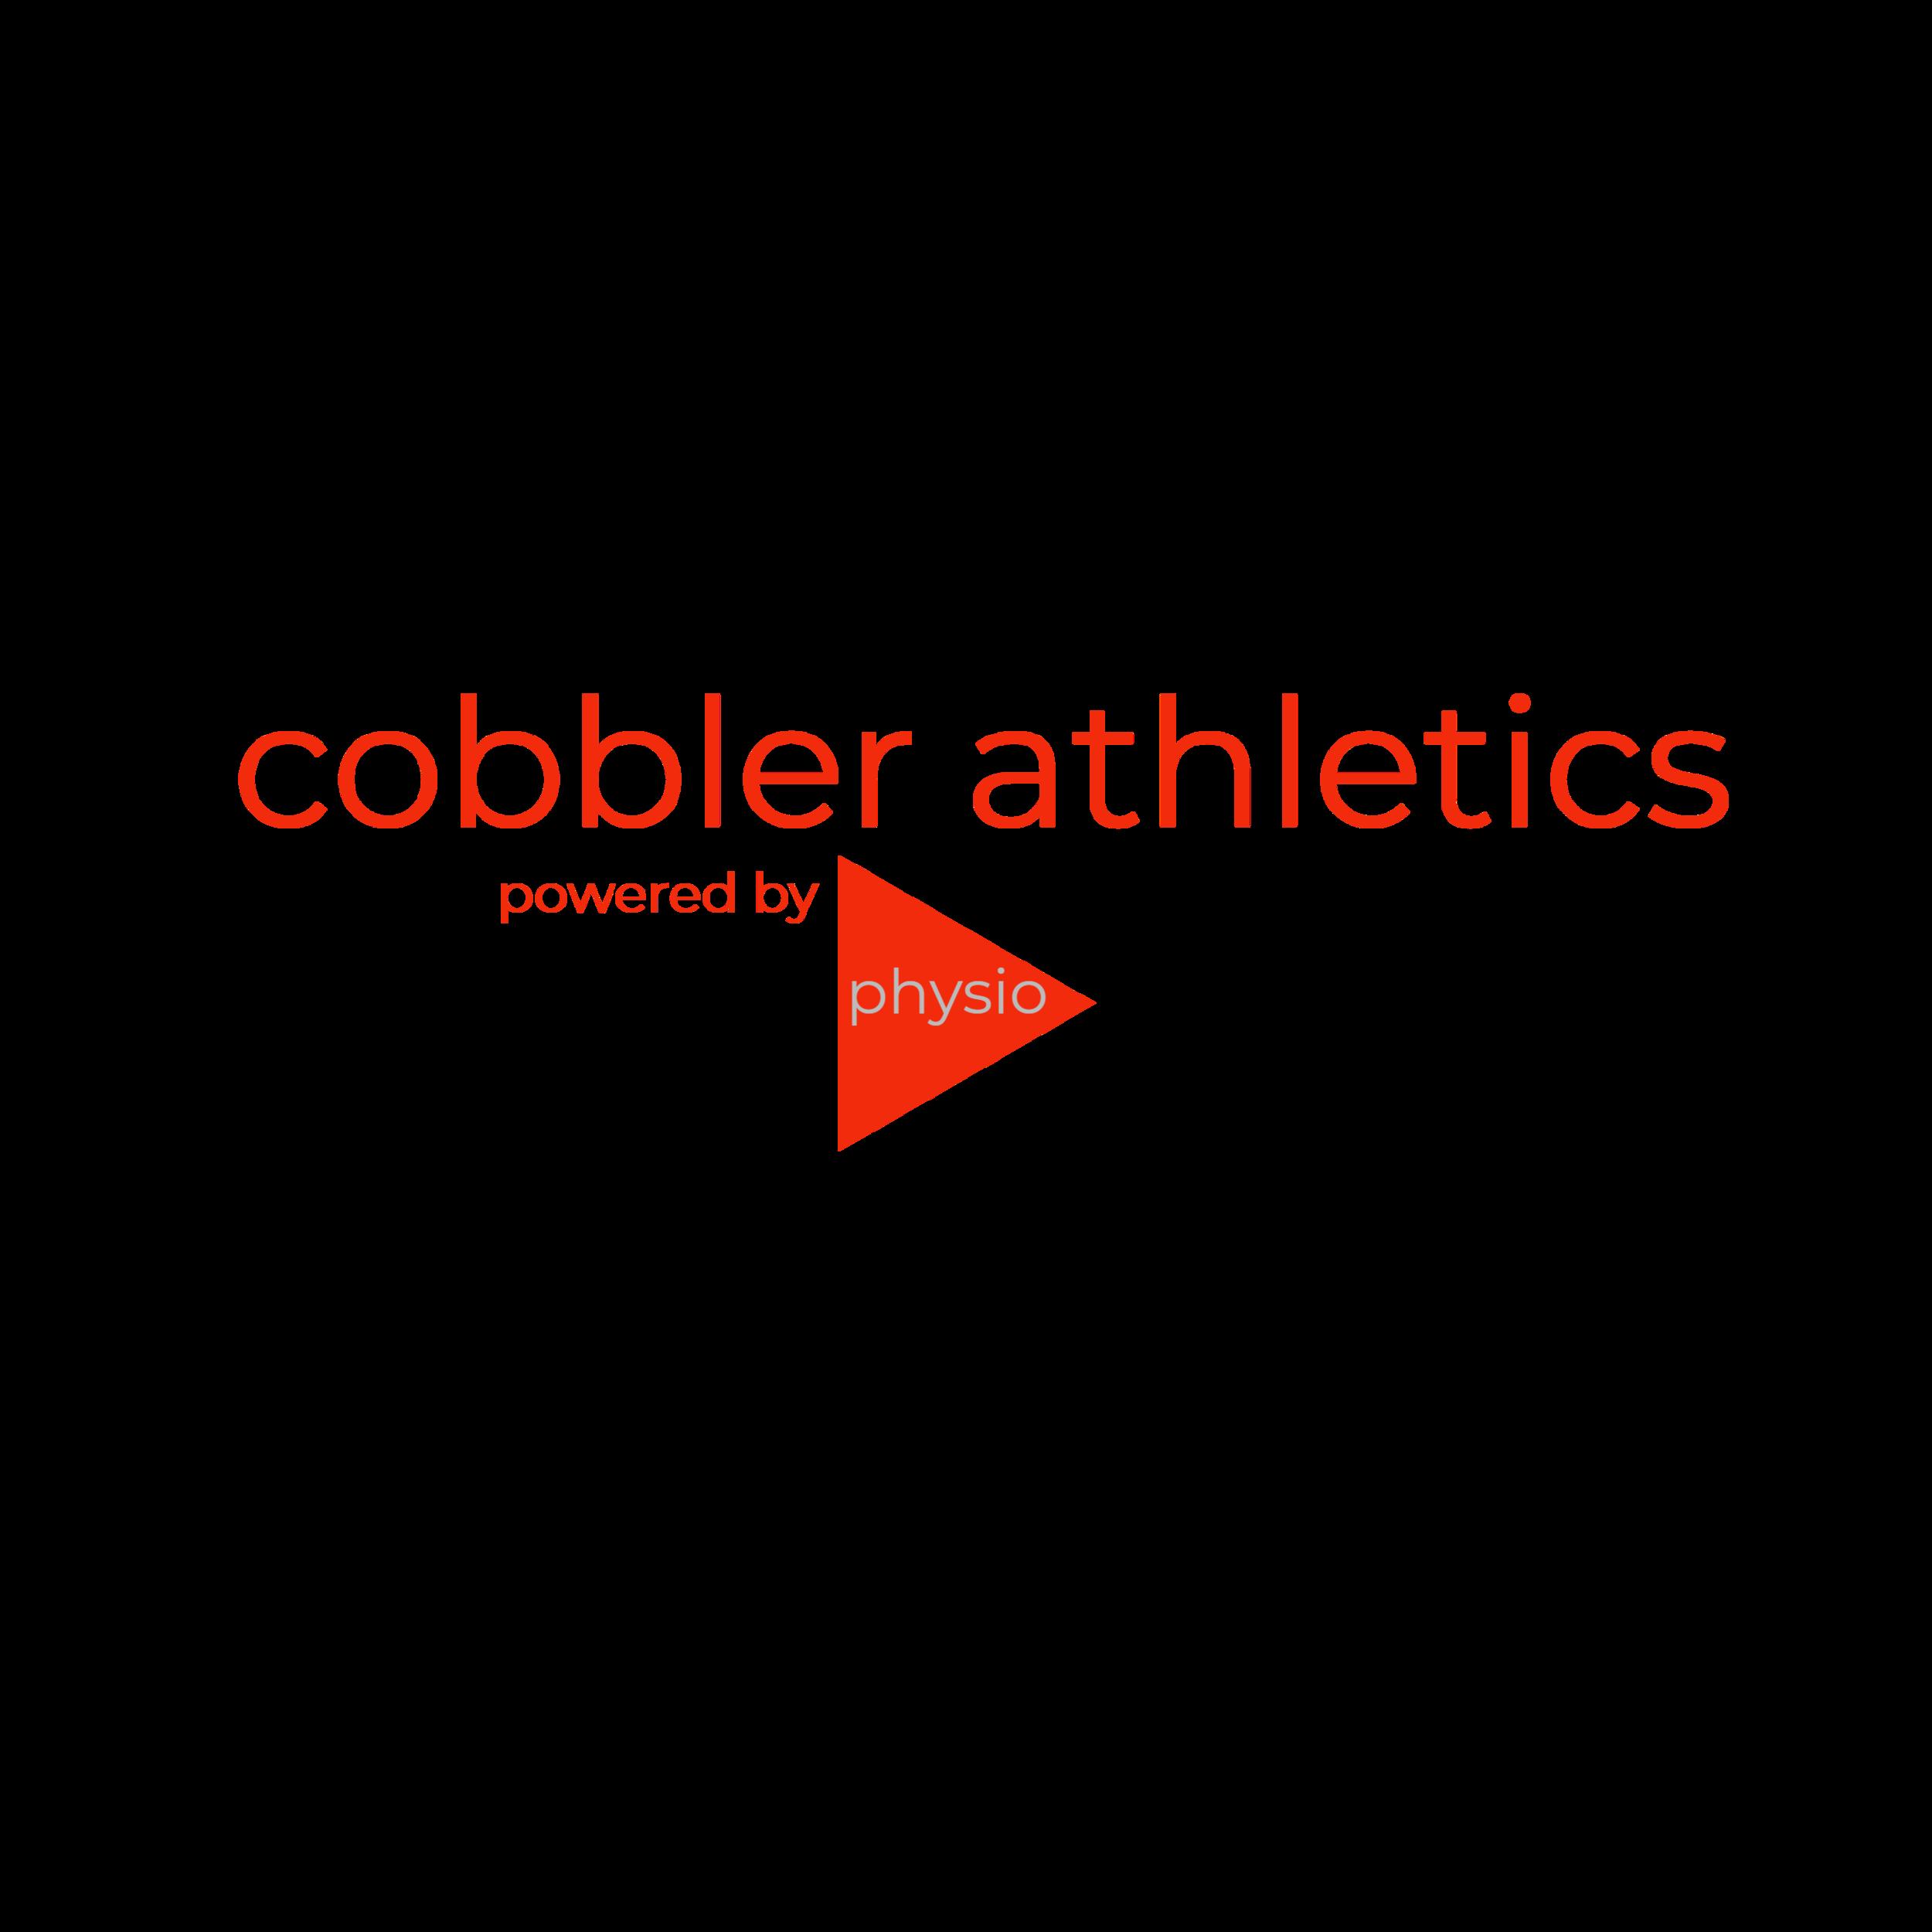 cobbler athletics.png